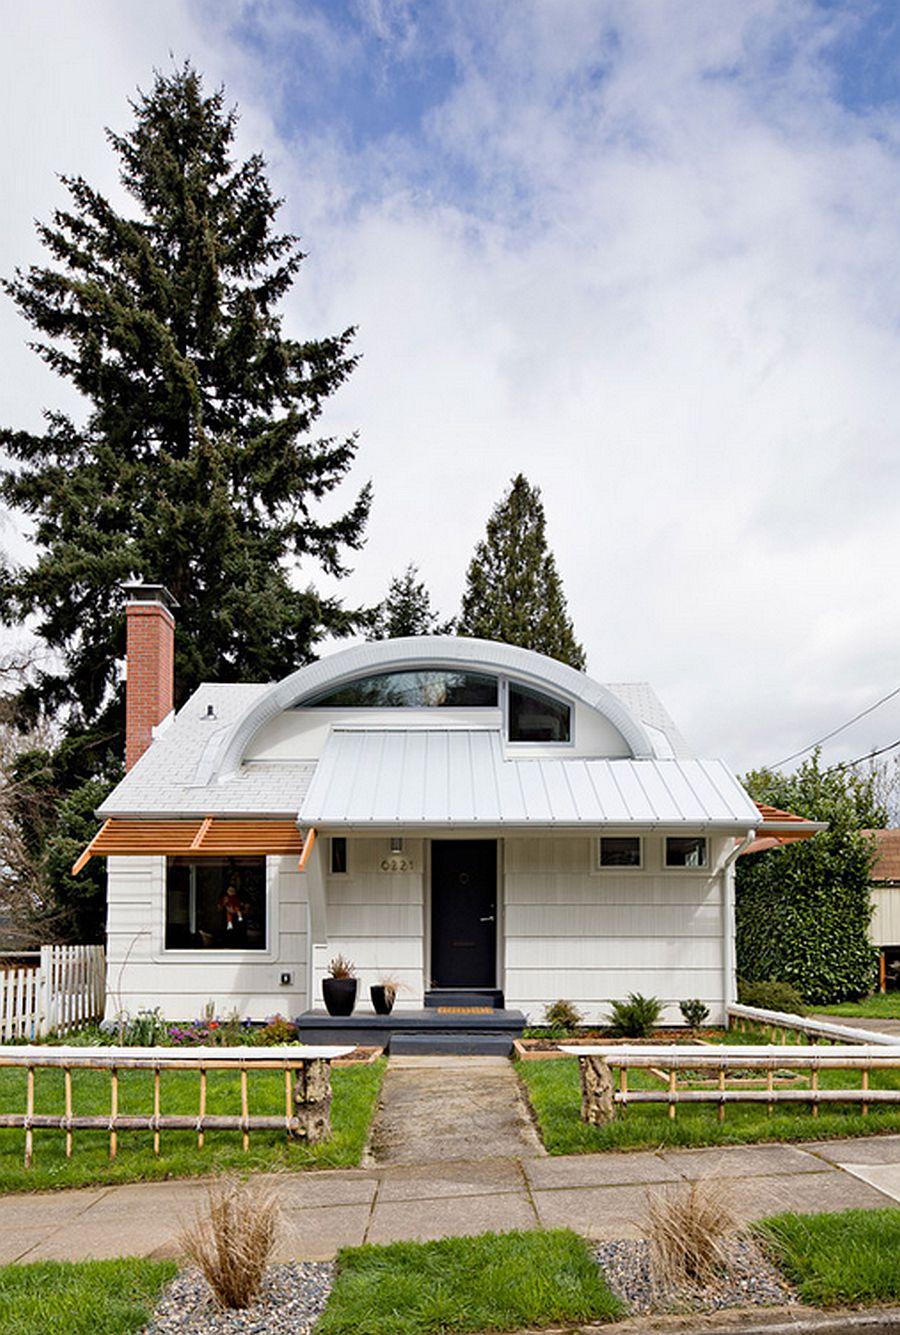 Casa dupa transformare